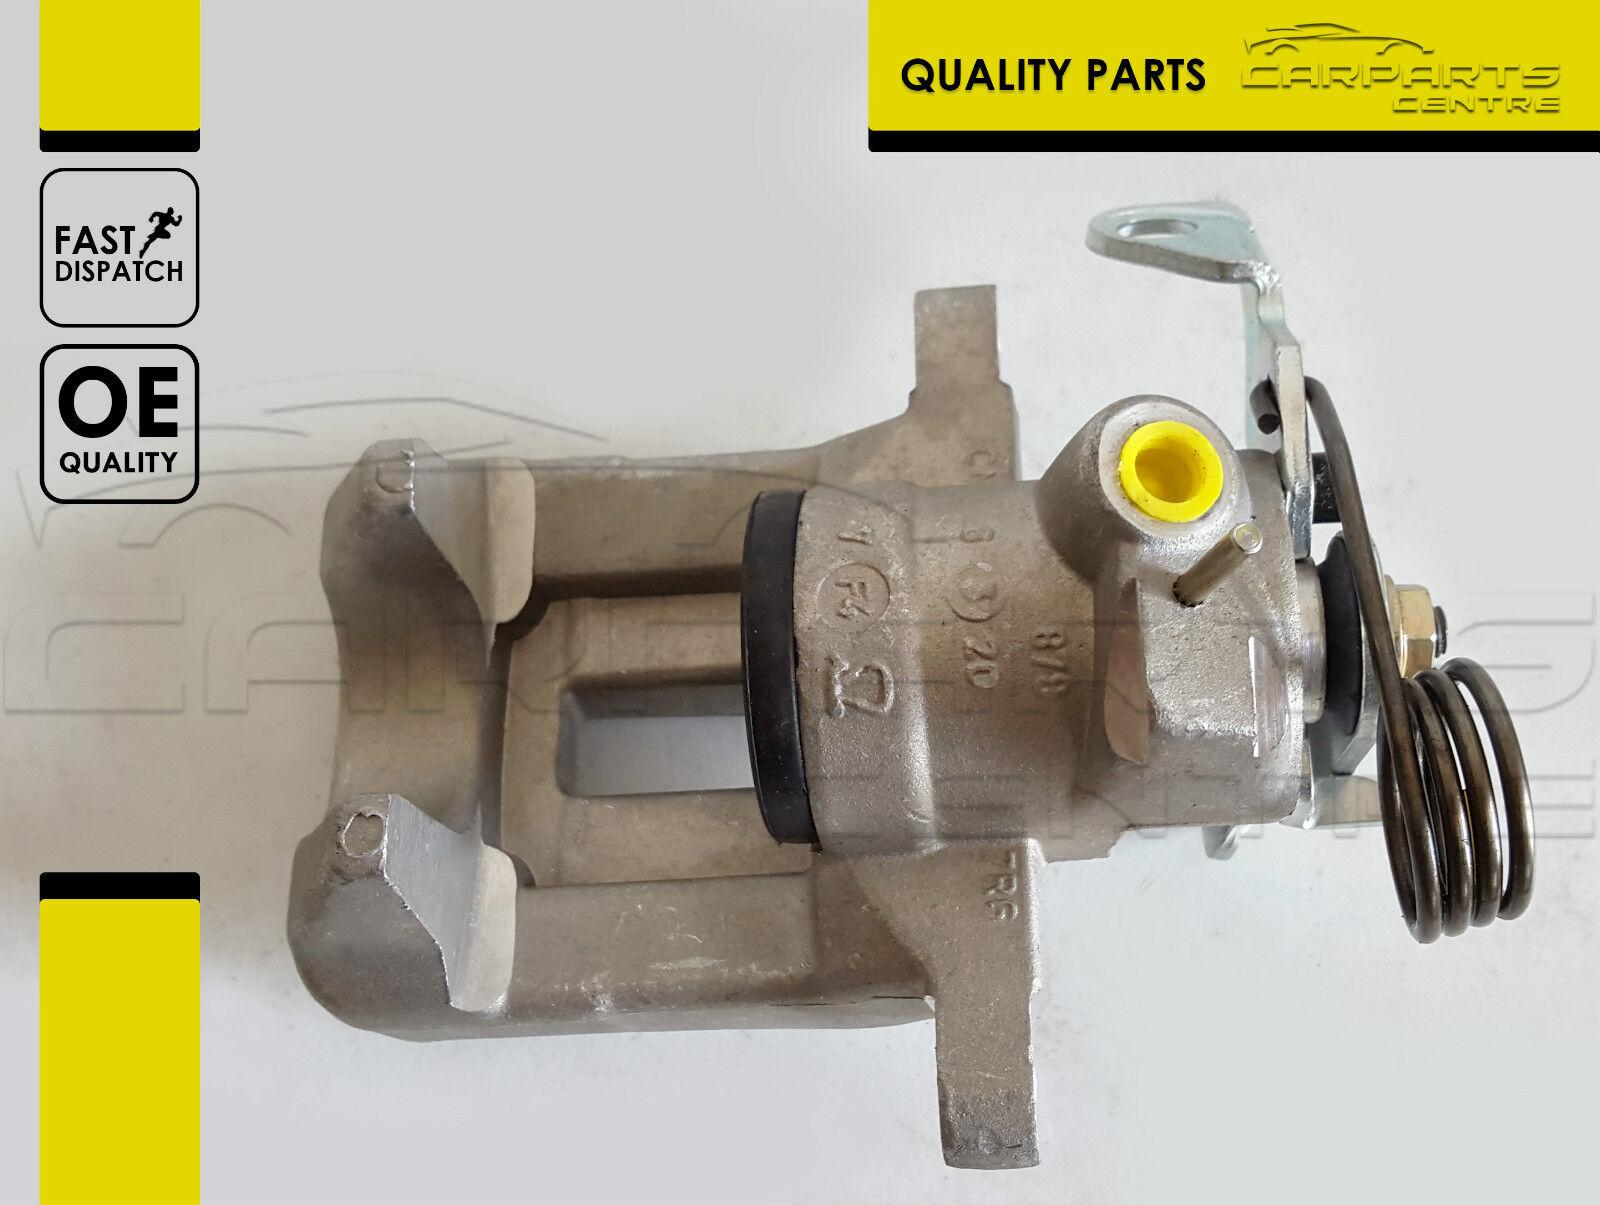 FOR VW PASSAT 3B2 3B3 3B5 3B6 1996-2005 REAR BRAKE DISCS PADS CALIPERS NEW